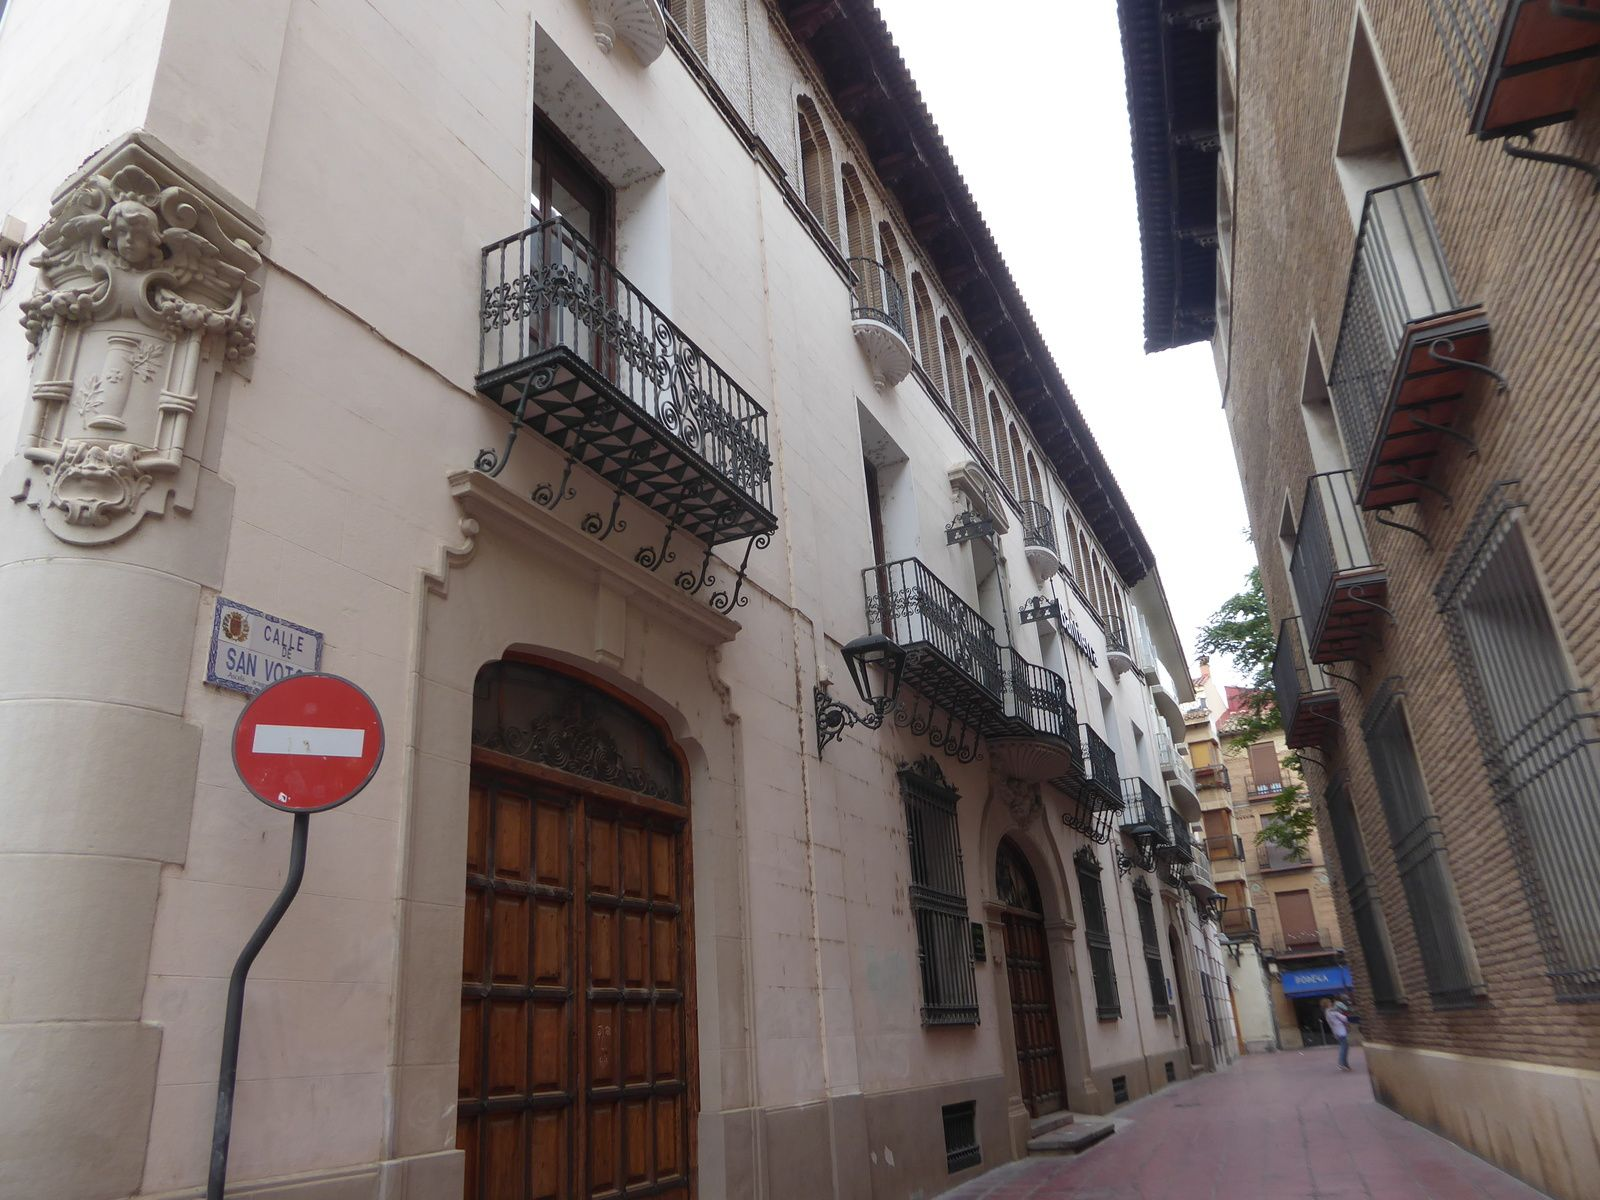 Espagne 2019 #20 Saragosse jour 3 après-midi